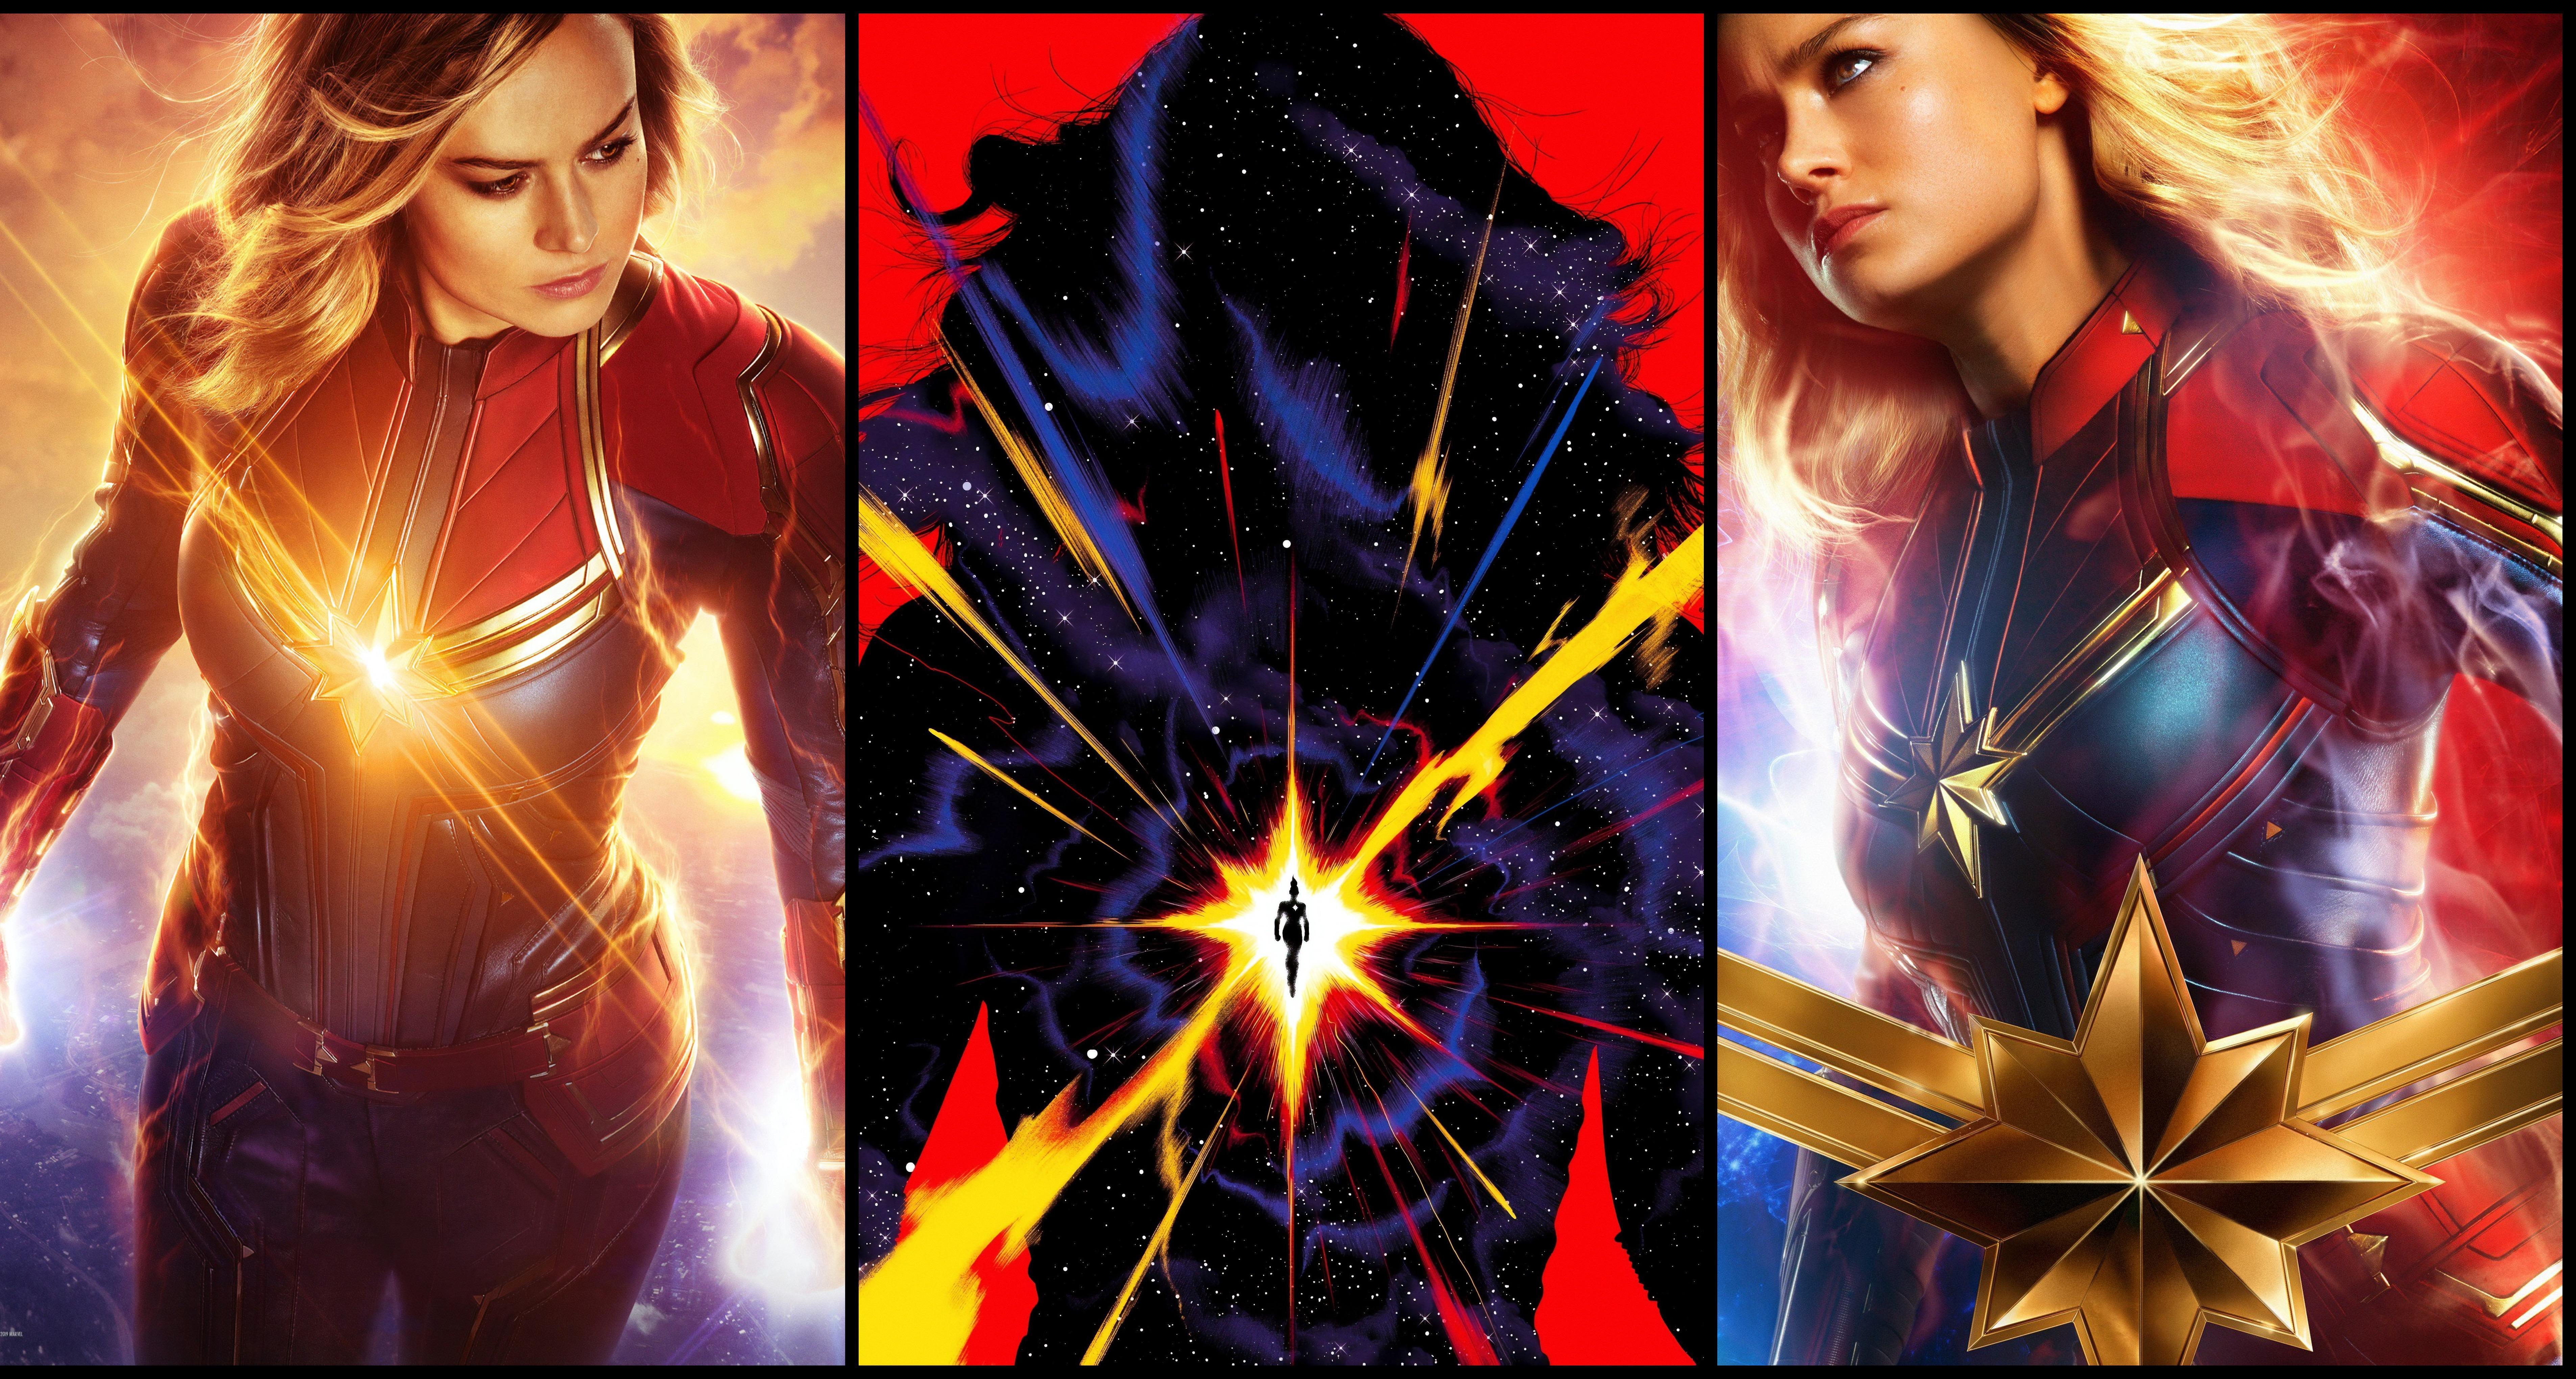 Captain Marvel Wallpaper Hd Movie Poster Wallpaper Captain Marvel Wallpaper Phone 7620x4080 Wallpaper Teahub Io